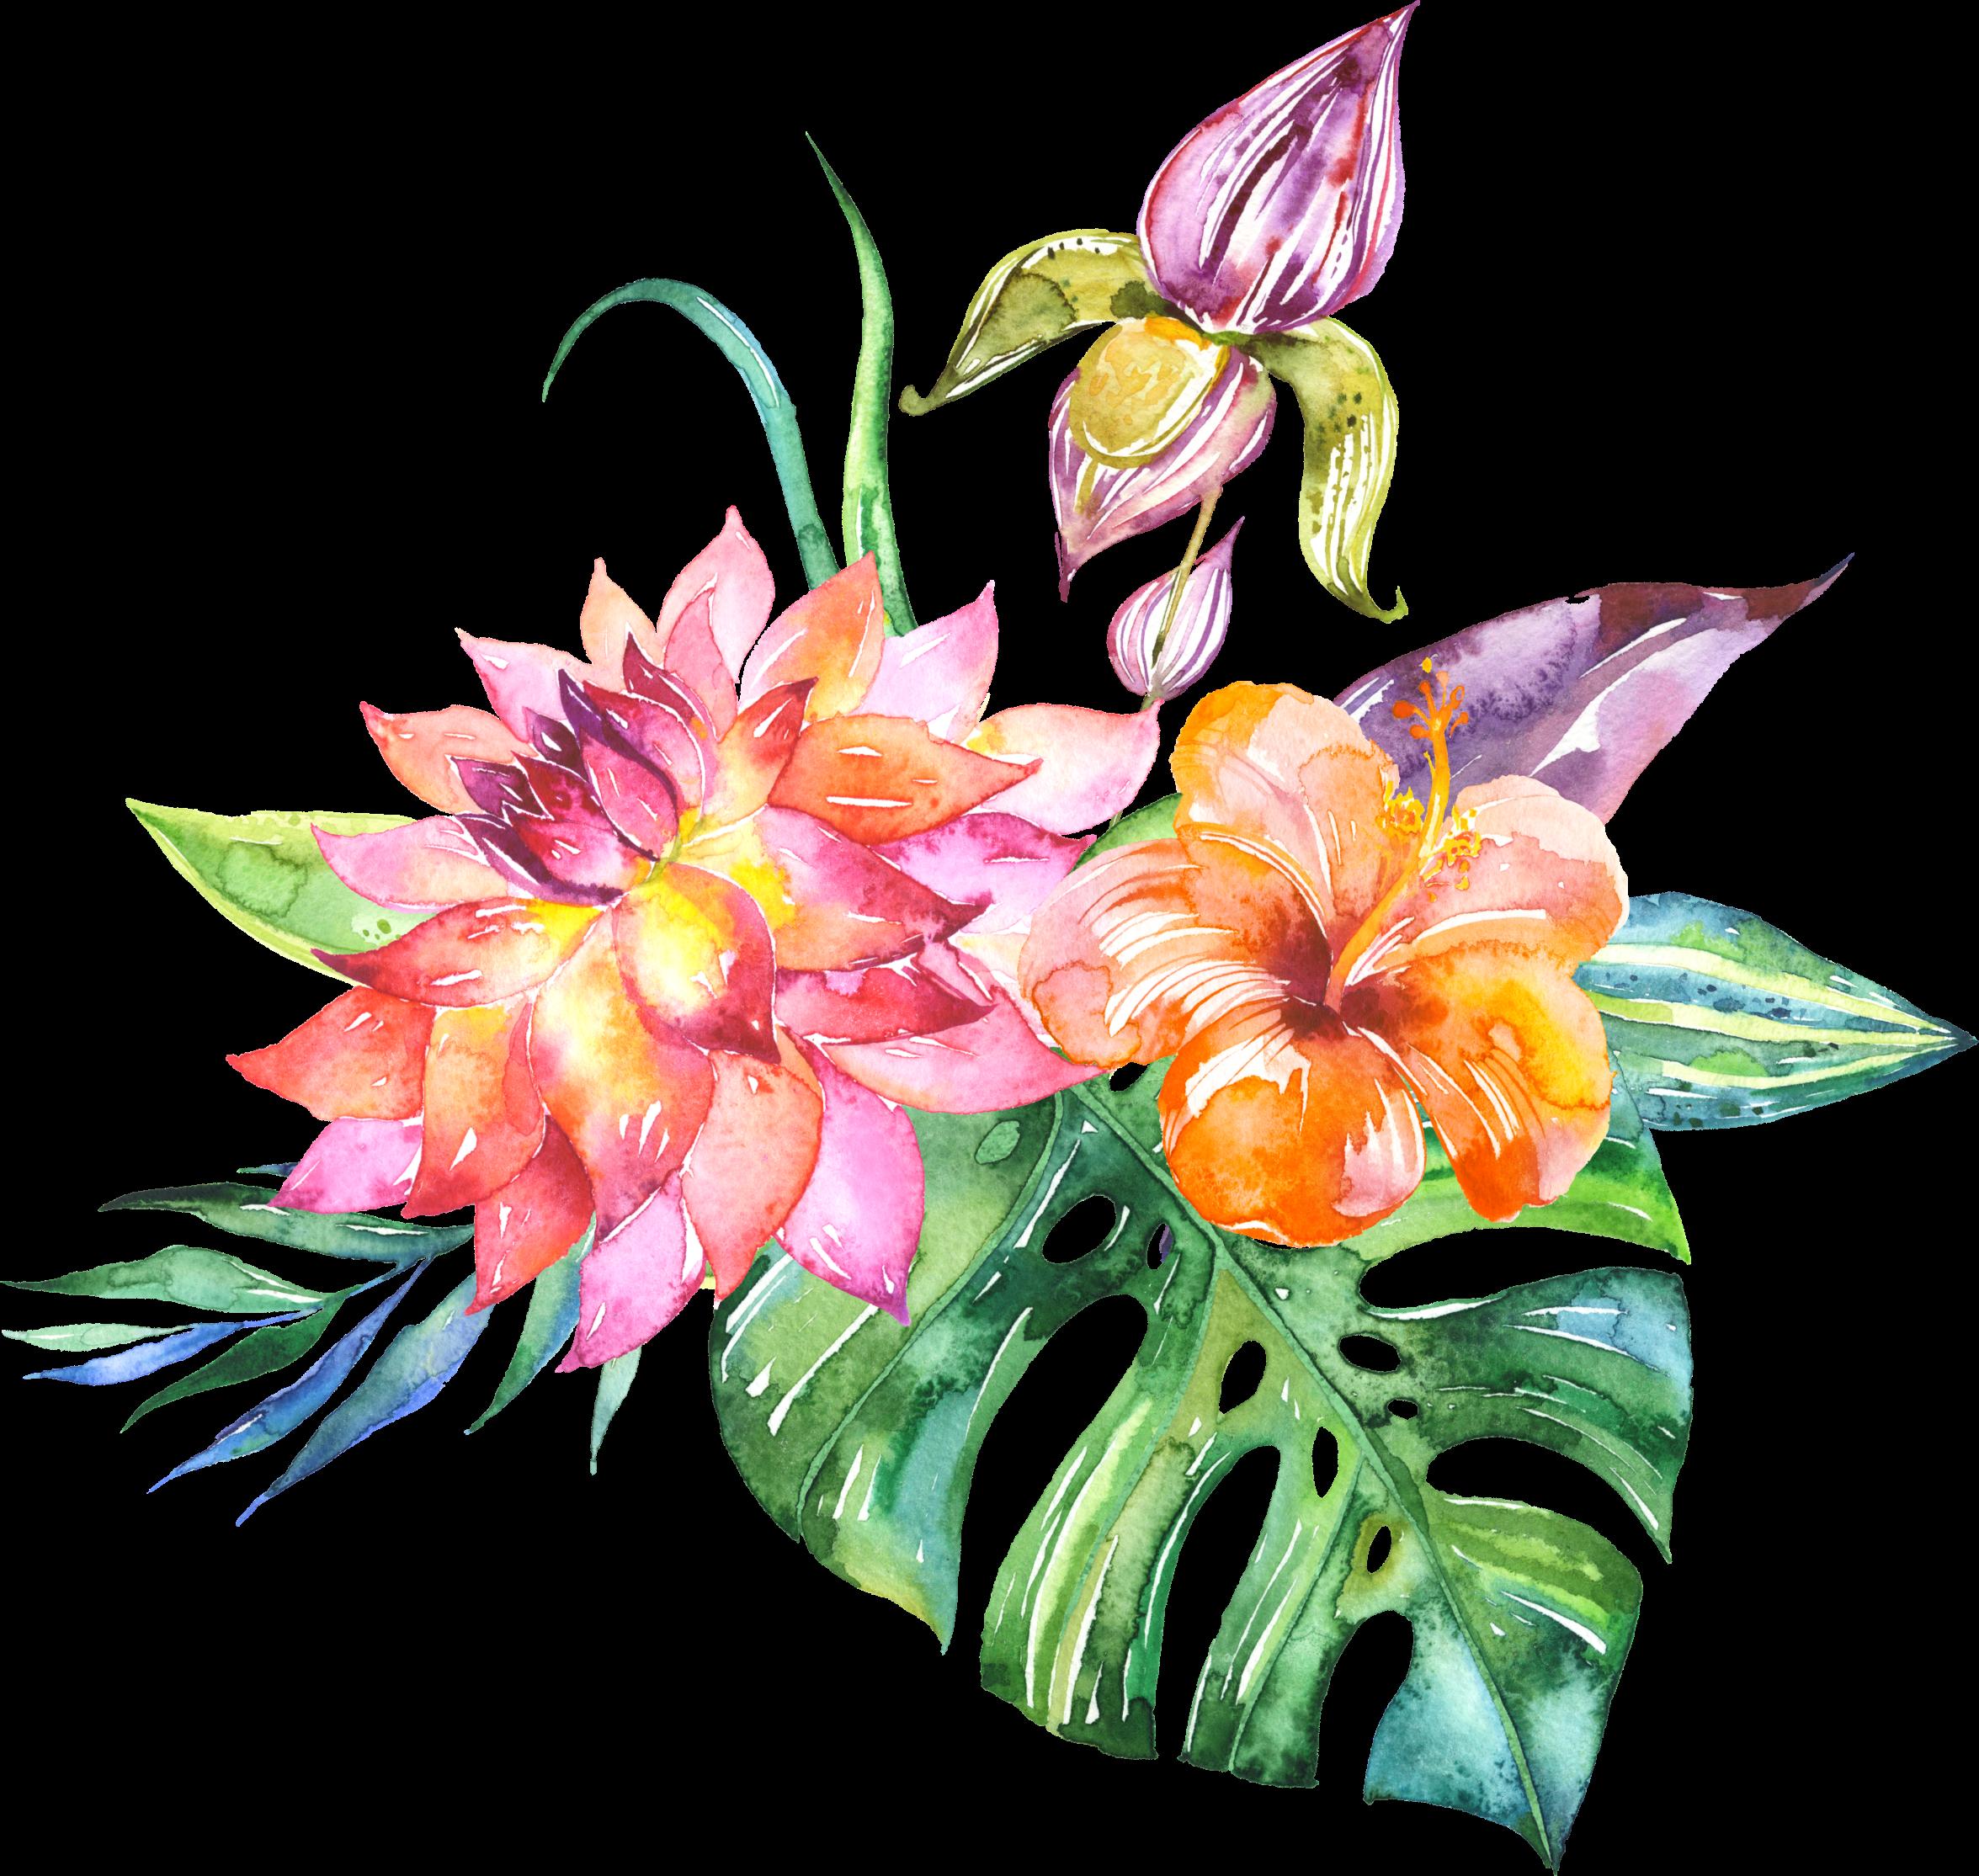 Wedding flower bouquet clipart clip free stock Wedding invitation Cut flowers Watercolor painting Flower bouquet ... clip free stock